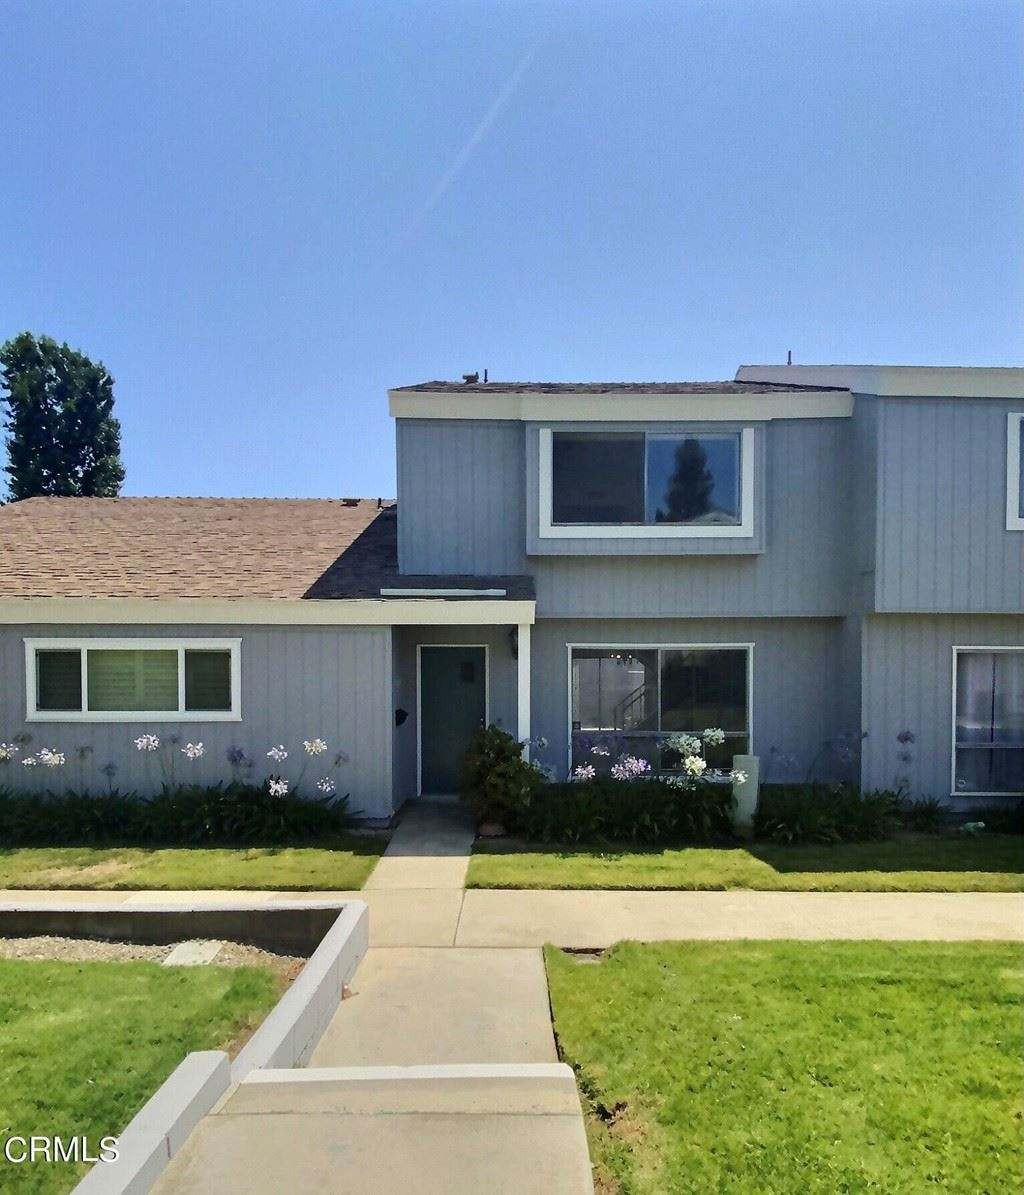 23523 Deer Spring Lane, Diamond Bar, CA 91765 - MLS#: P1-5796